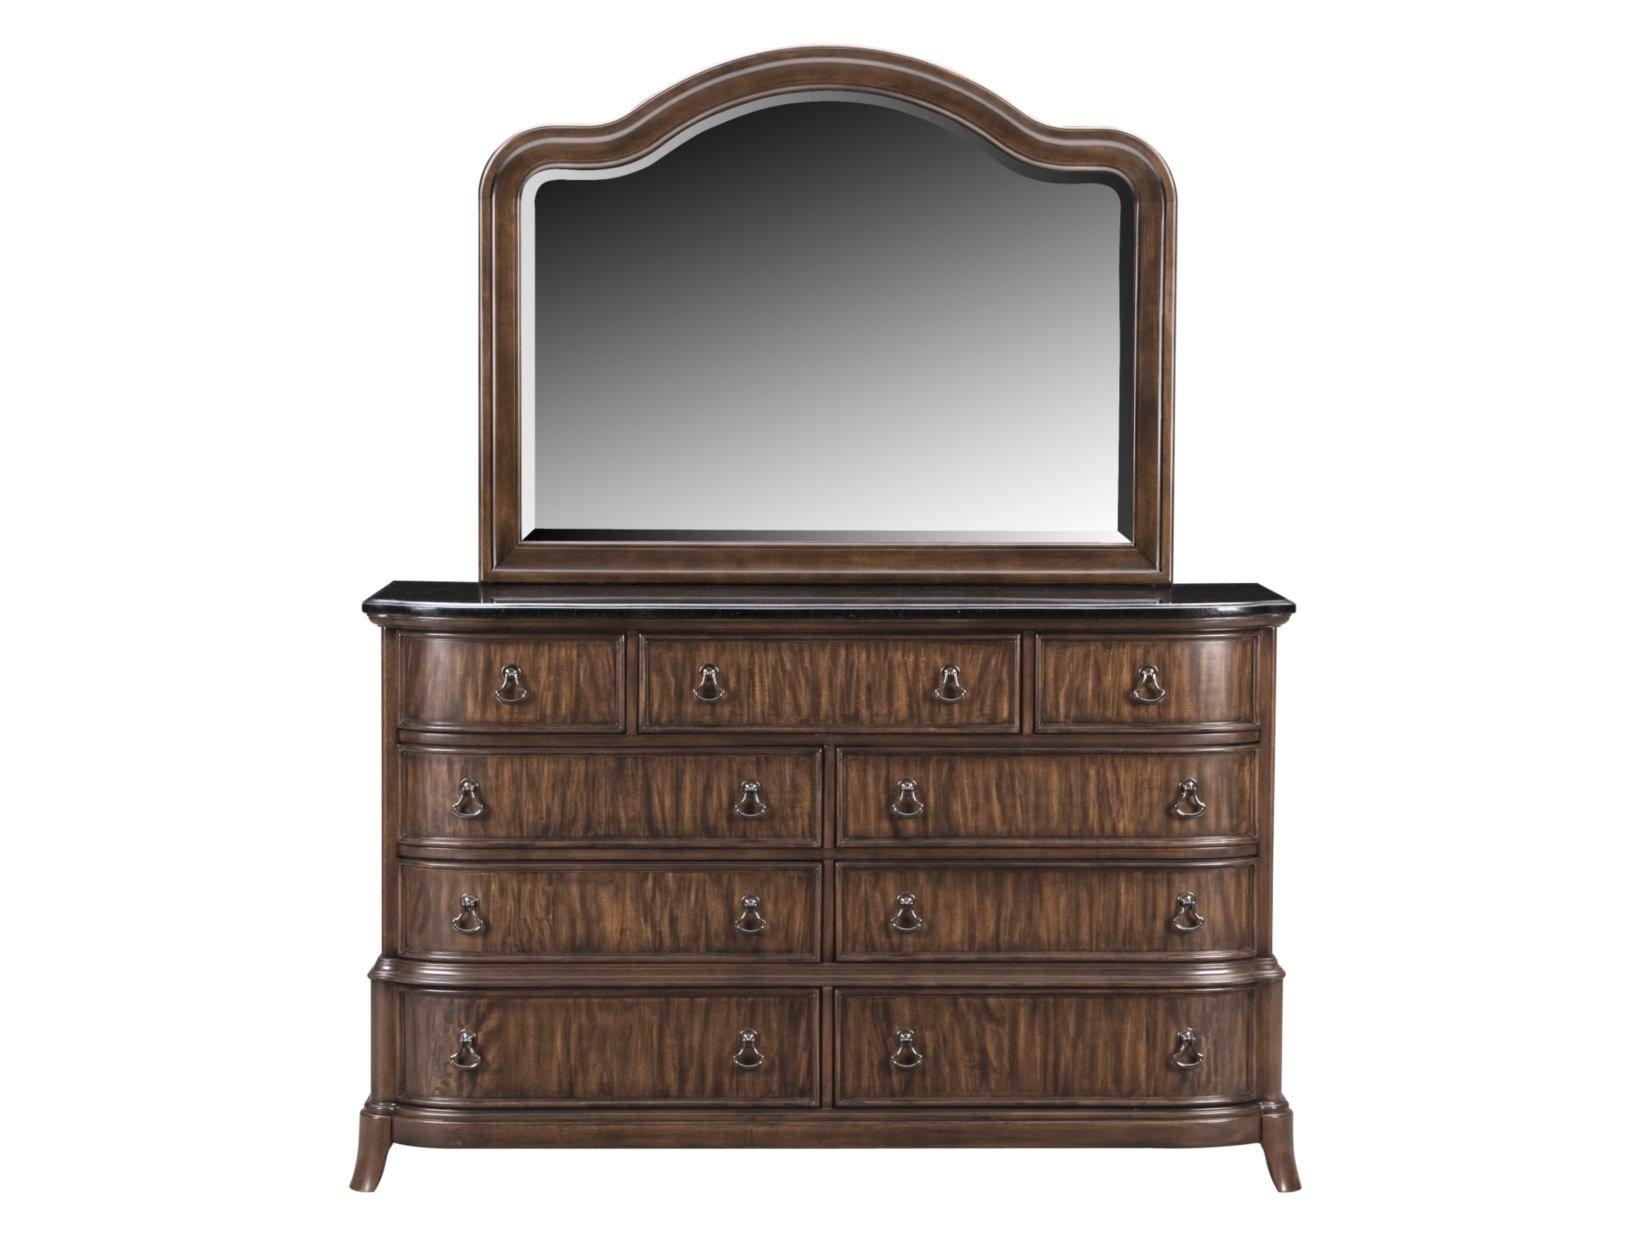 Kingston Bedroom Furniture Kingston Nutmeg Dresser Mirror Value City Furniture Bedroom